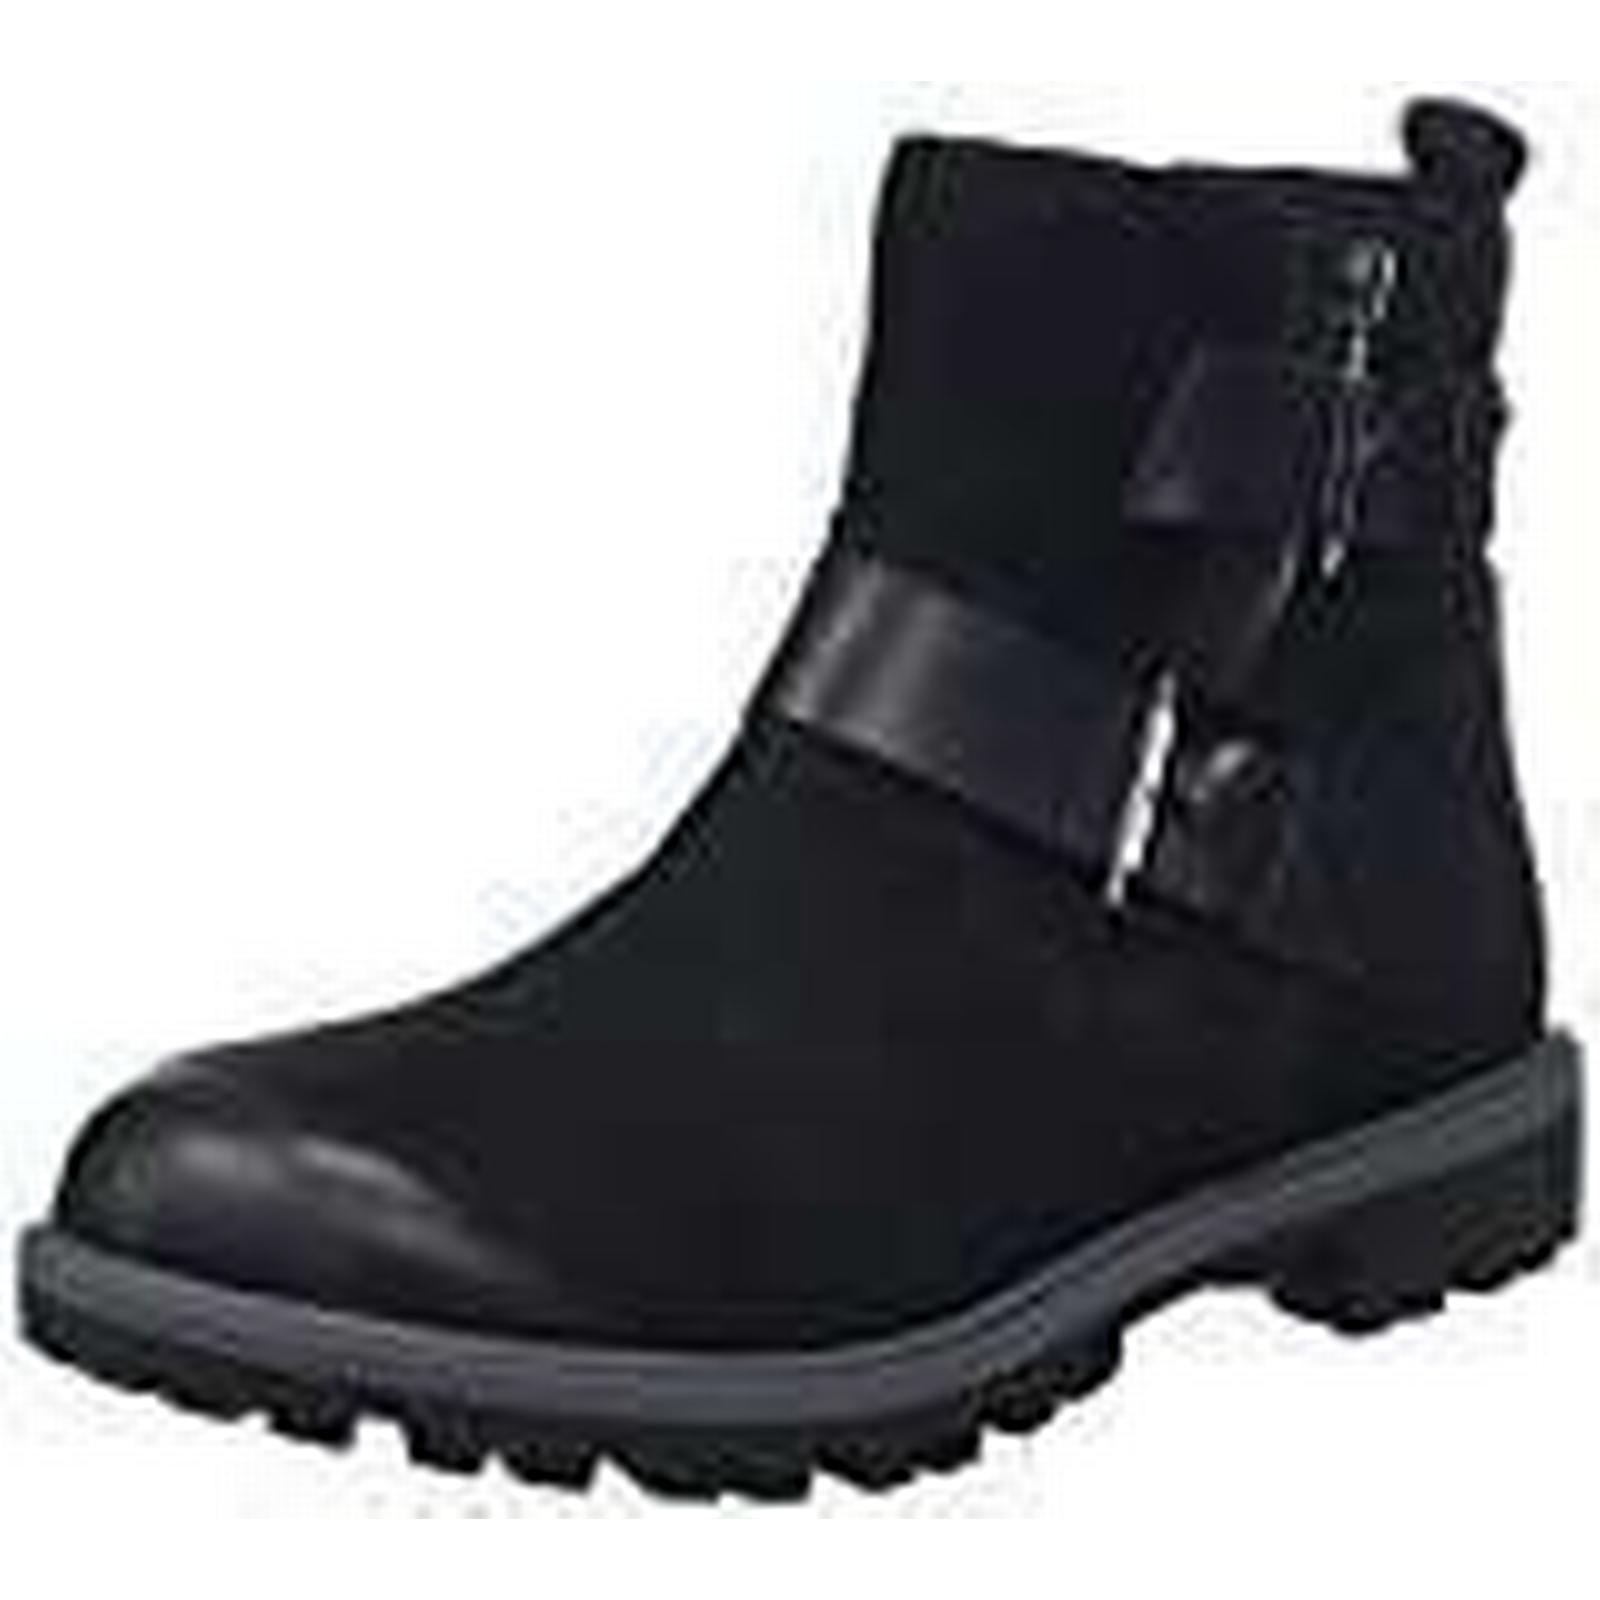 Tamaris 25411, Women's UK Ankle Boots, Black, 4 UK Women's (37 EU) a8134f